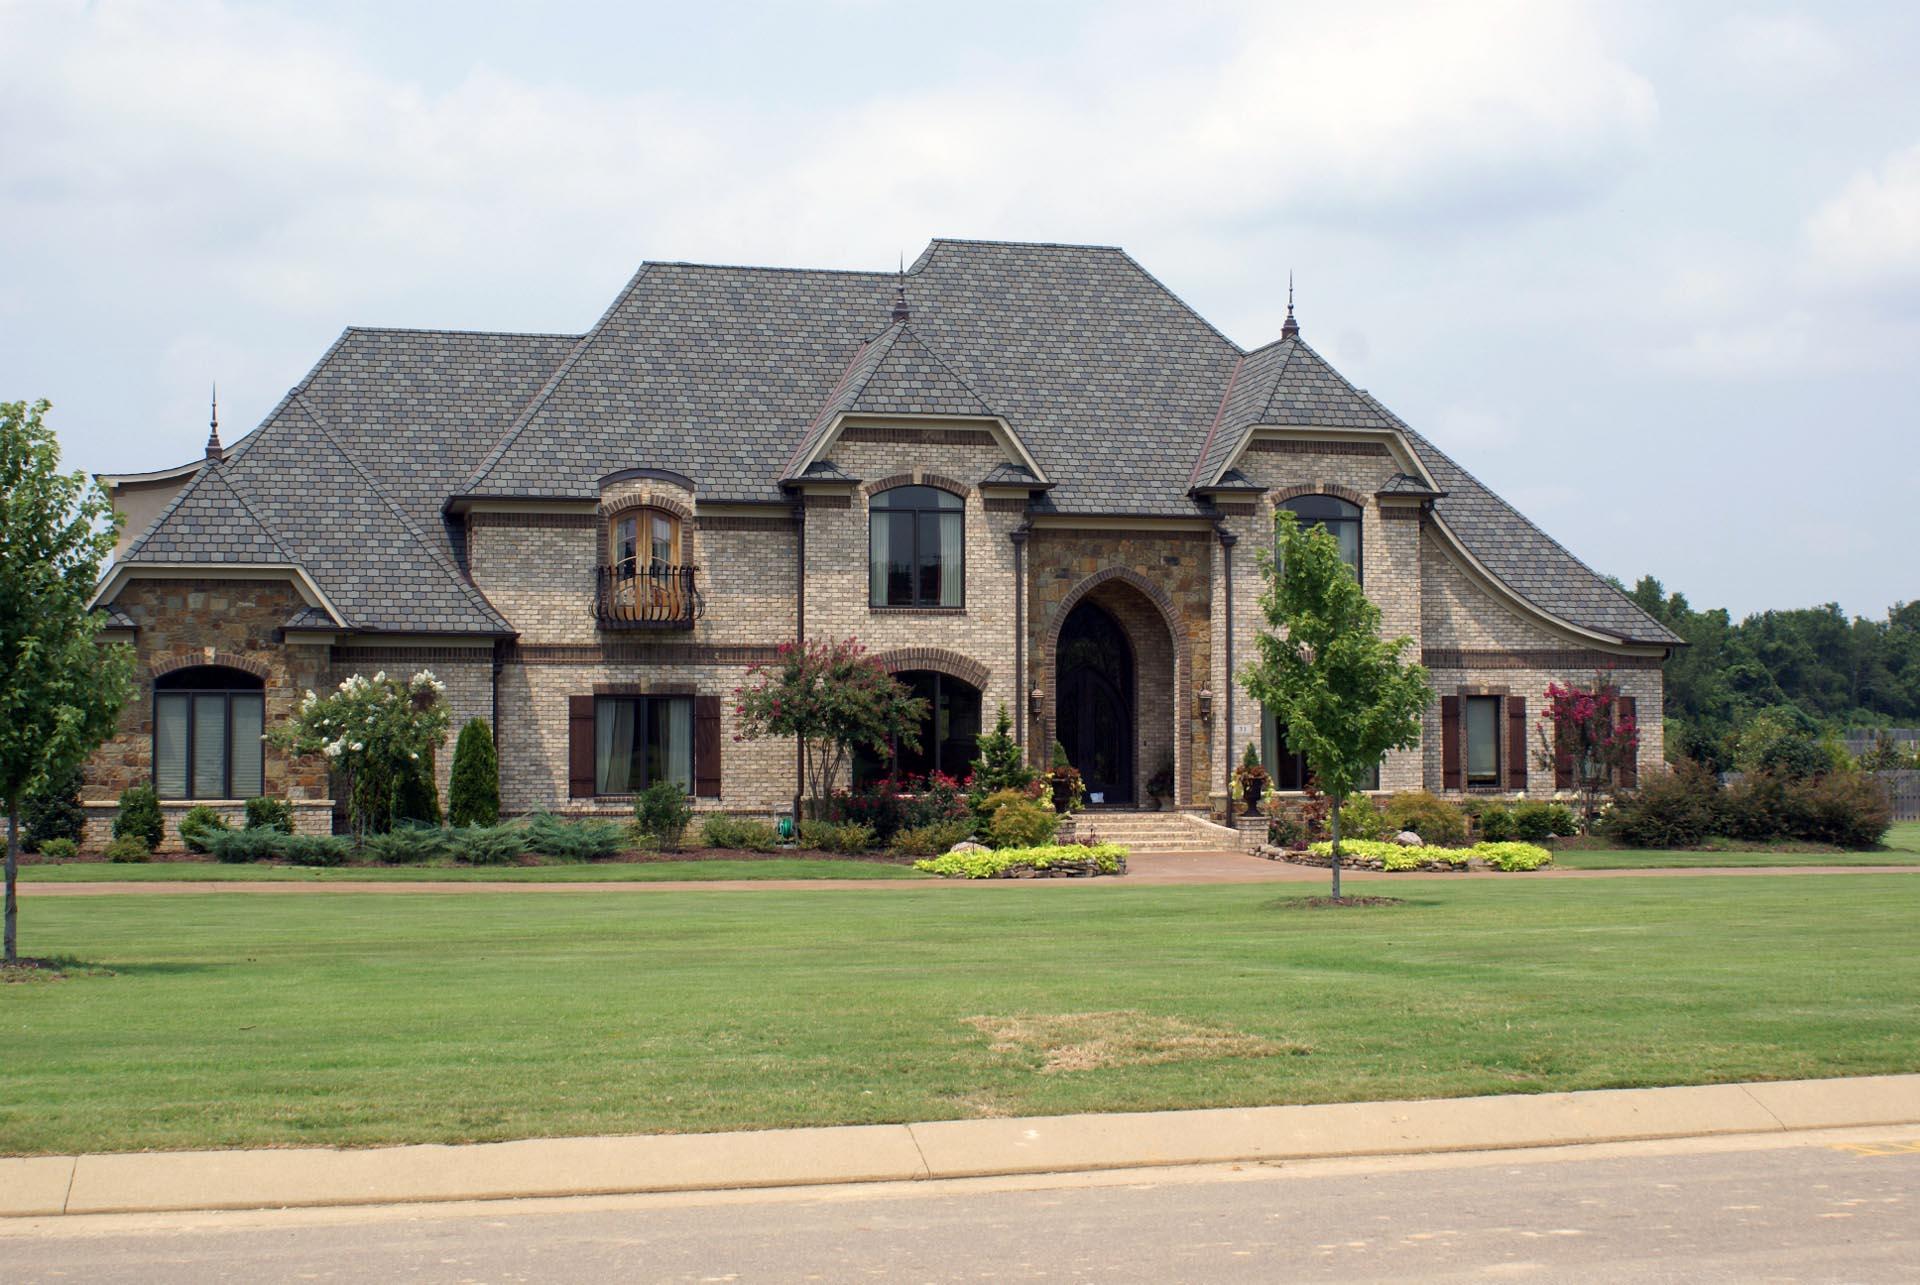 City Lumber Co. House Photo